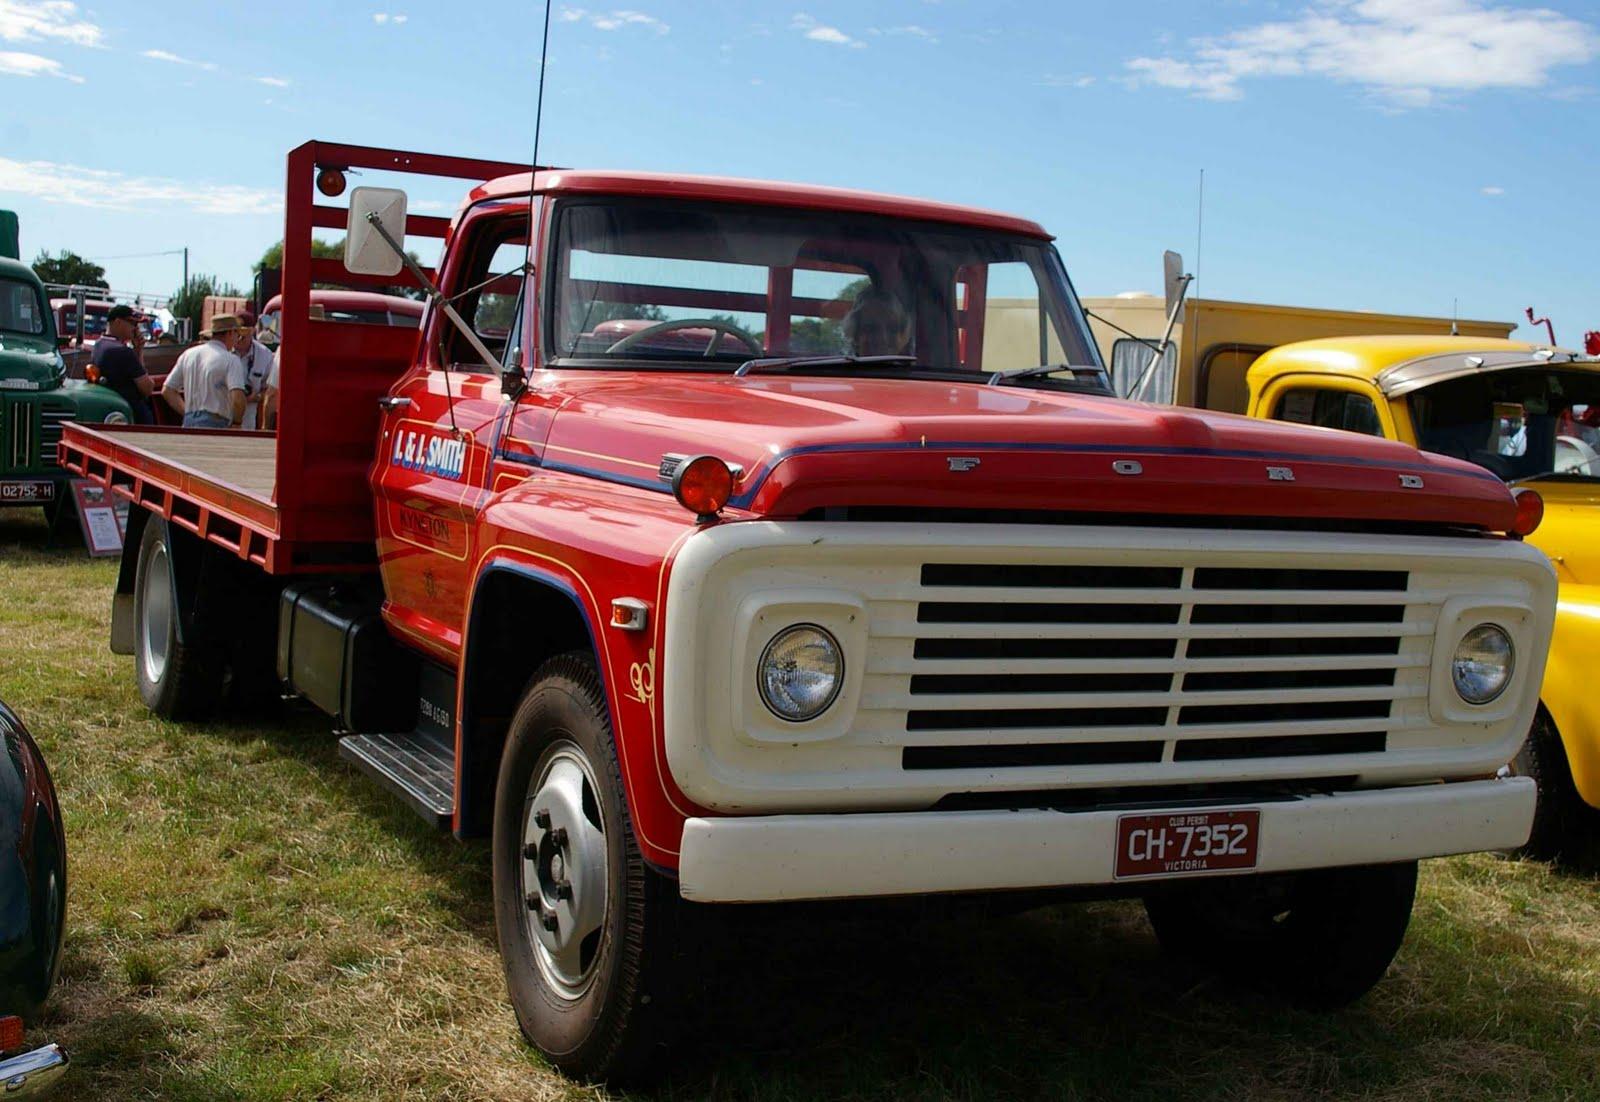 Historic Trucks: HCVC Ballarat Branch Clunes Truck Show 2011 - Part 2